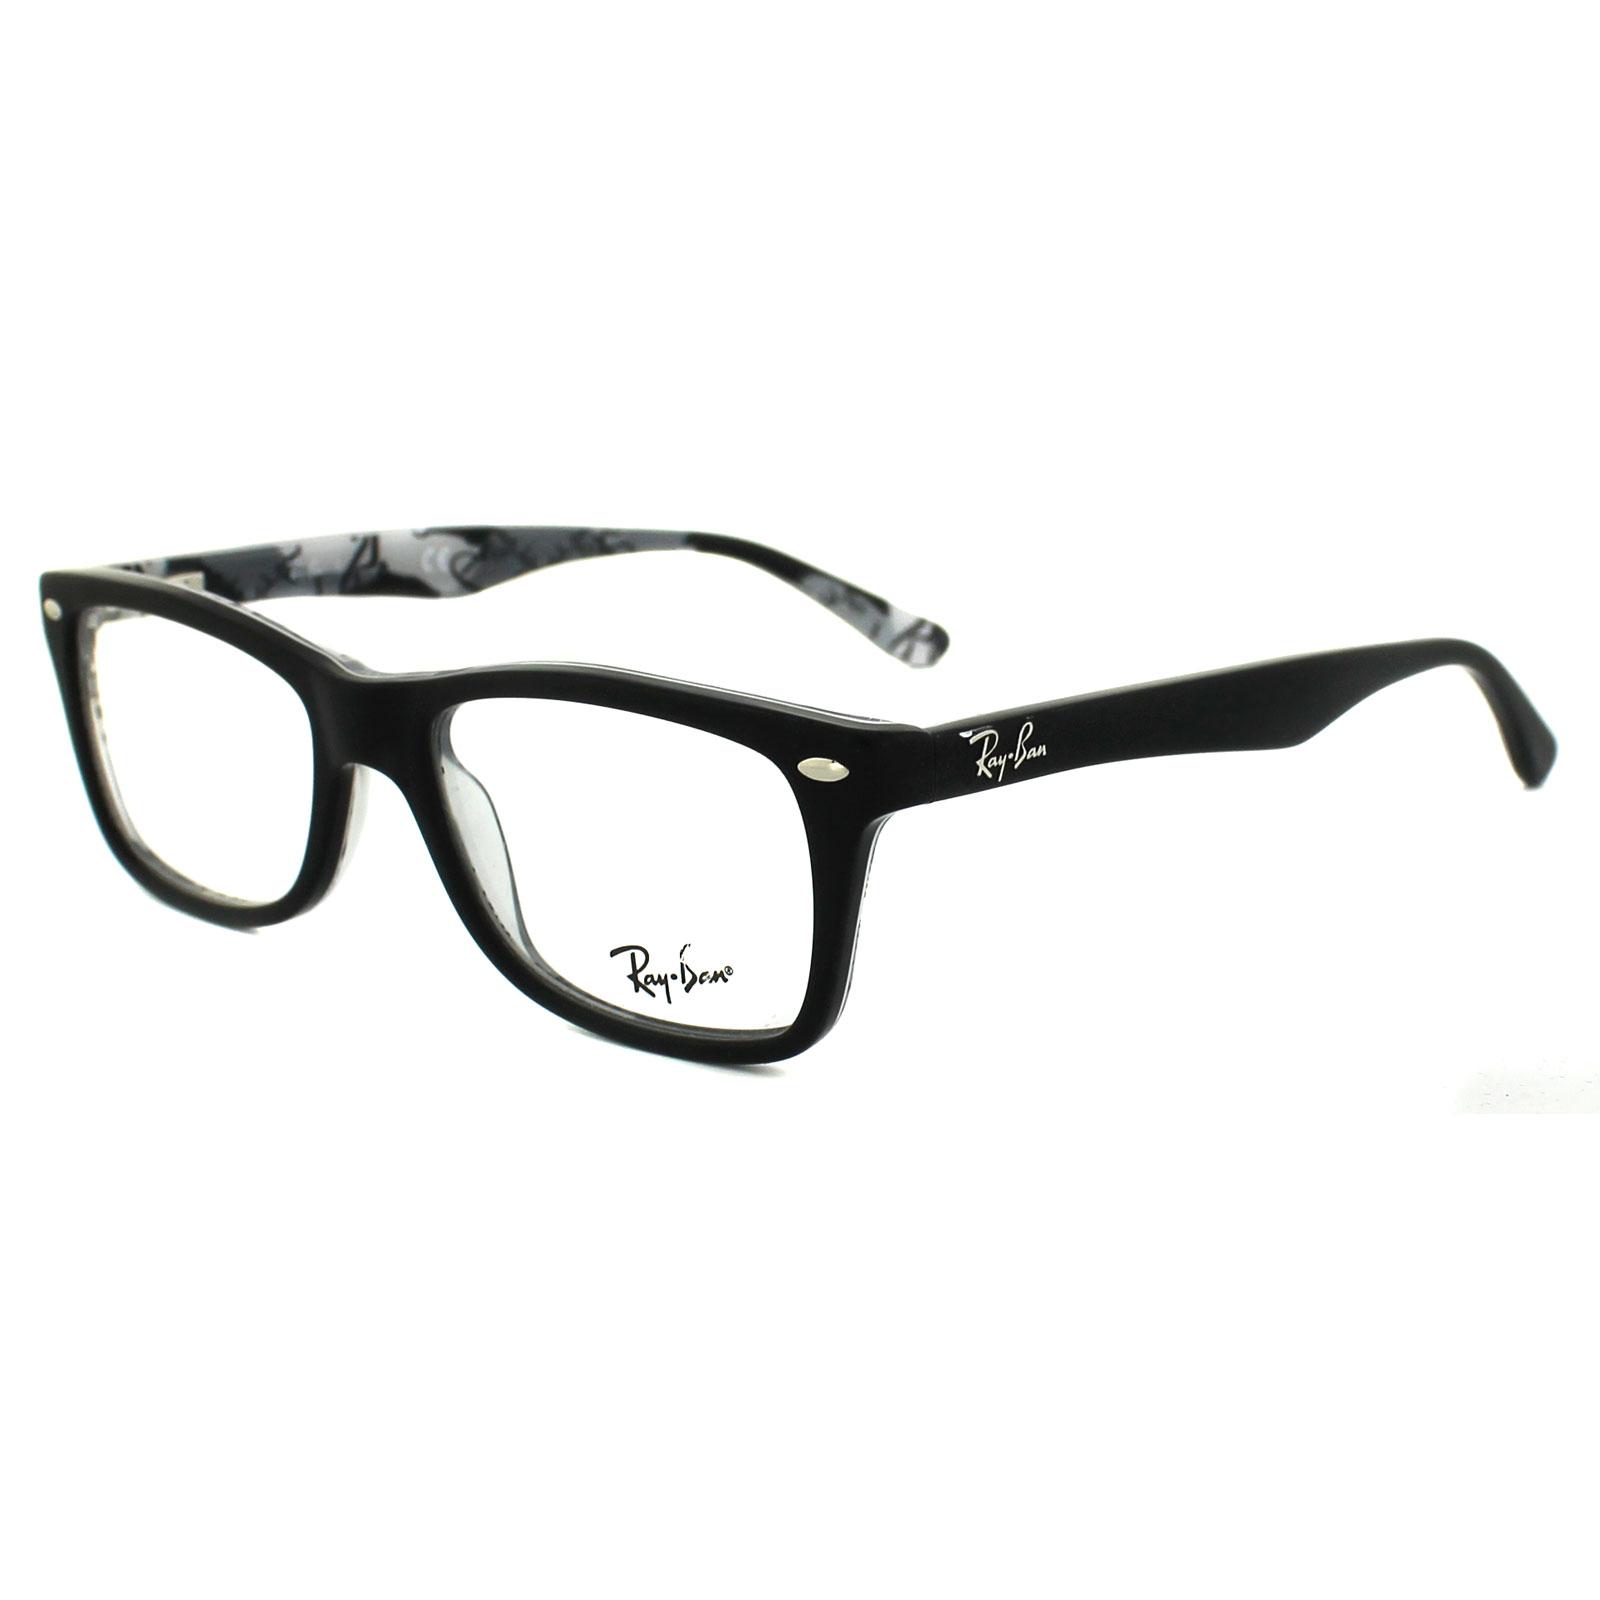 Ray-Ban Glasses Frames 5228 5405 Top Matt Black on Texture ...